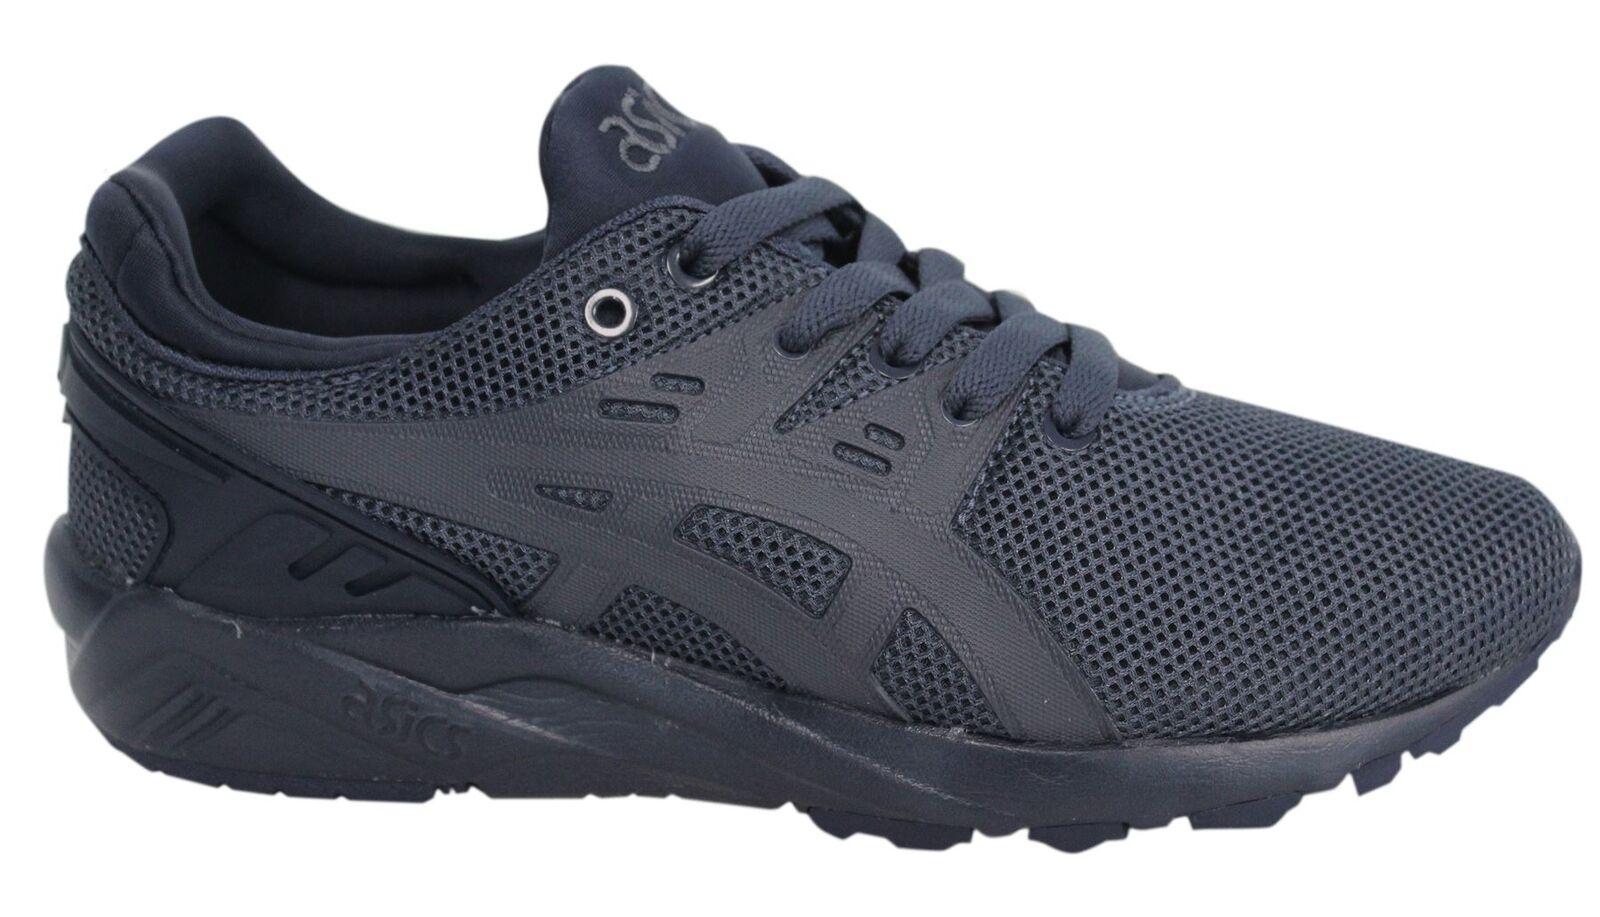 ASICS Gel Kayano TRAINER EVO Sneakers Scarpe da ginnastica Scarpe da corsa da uomo hn6a0 5050